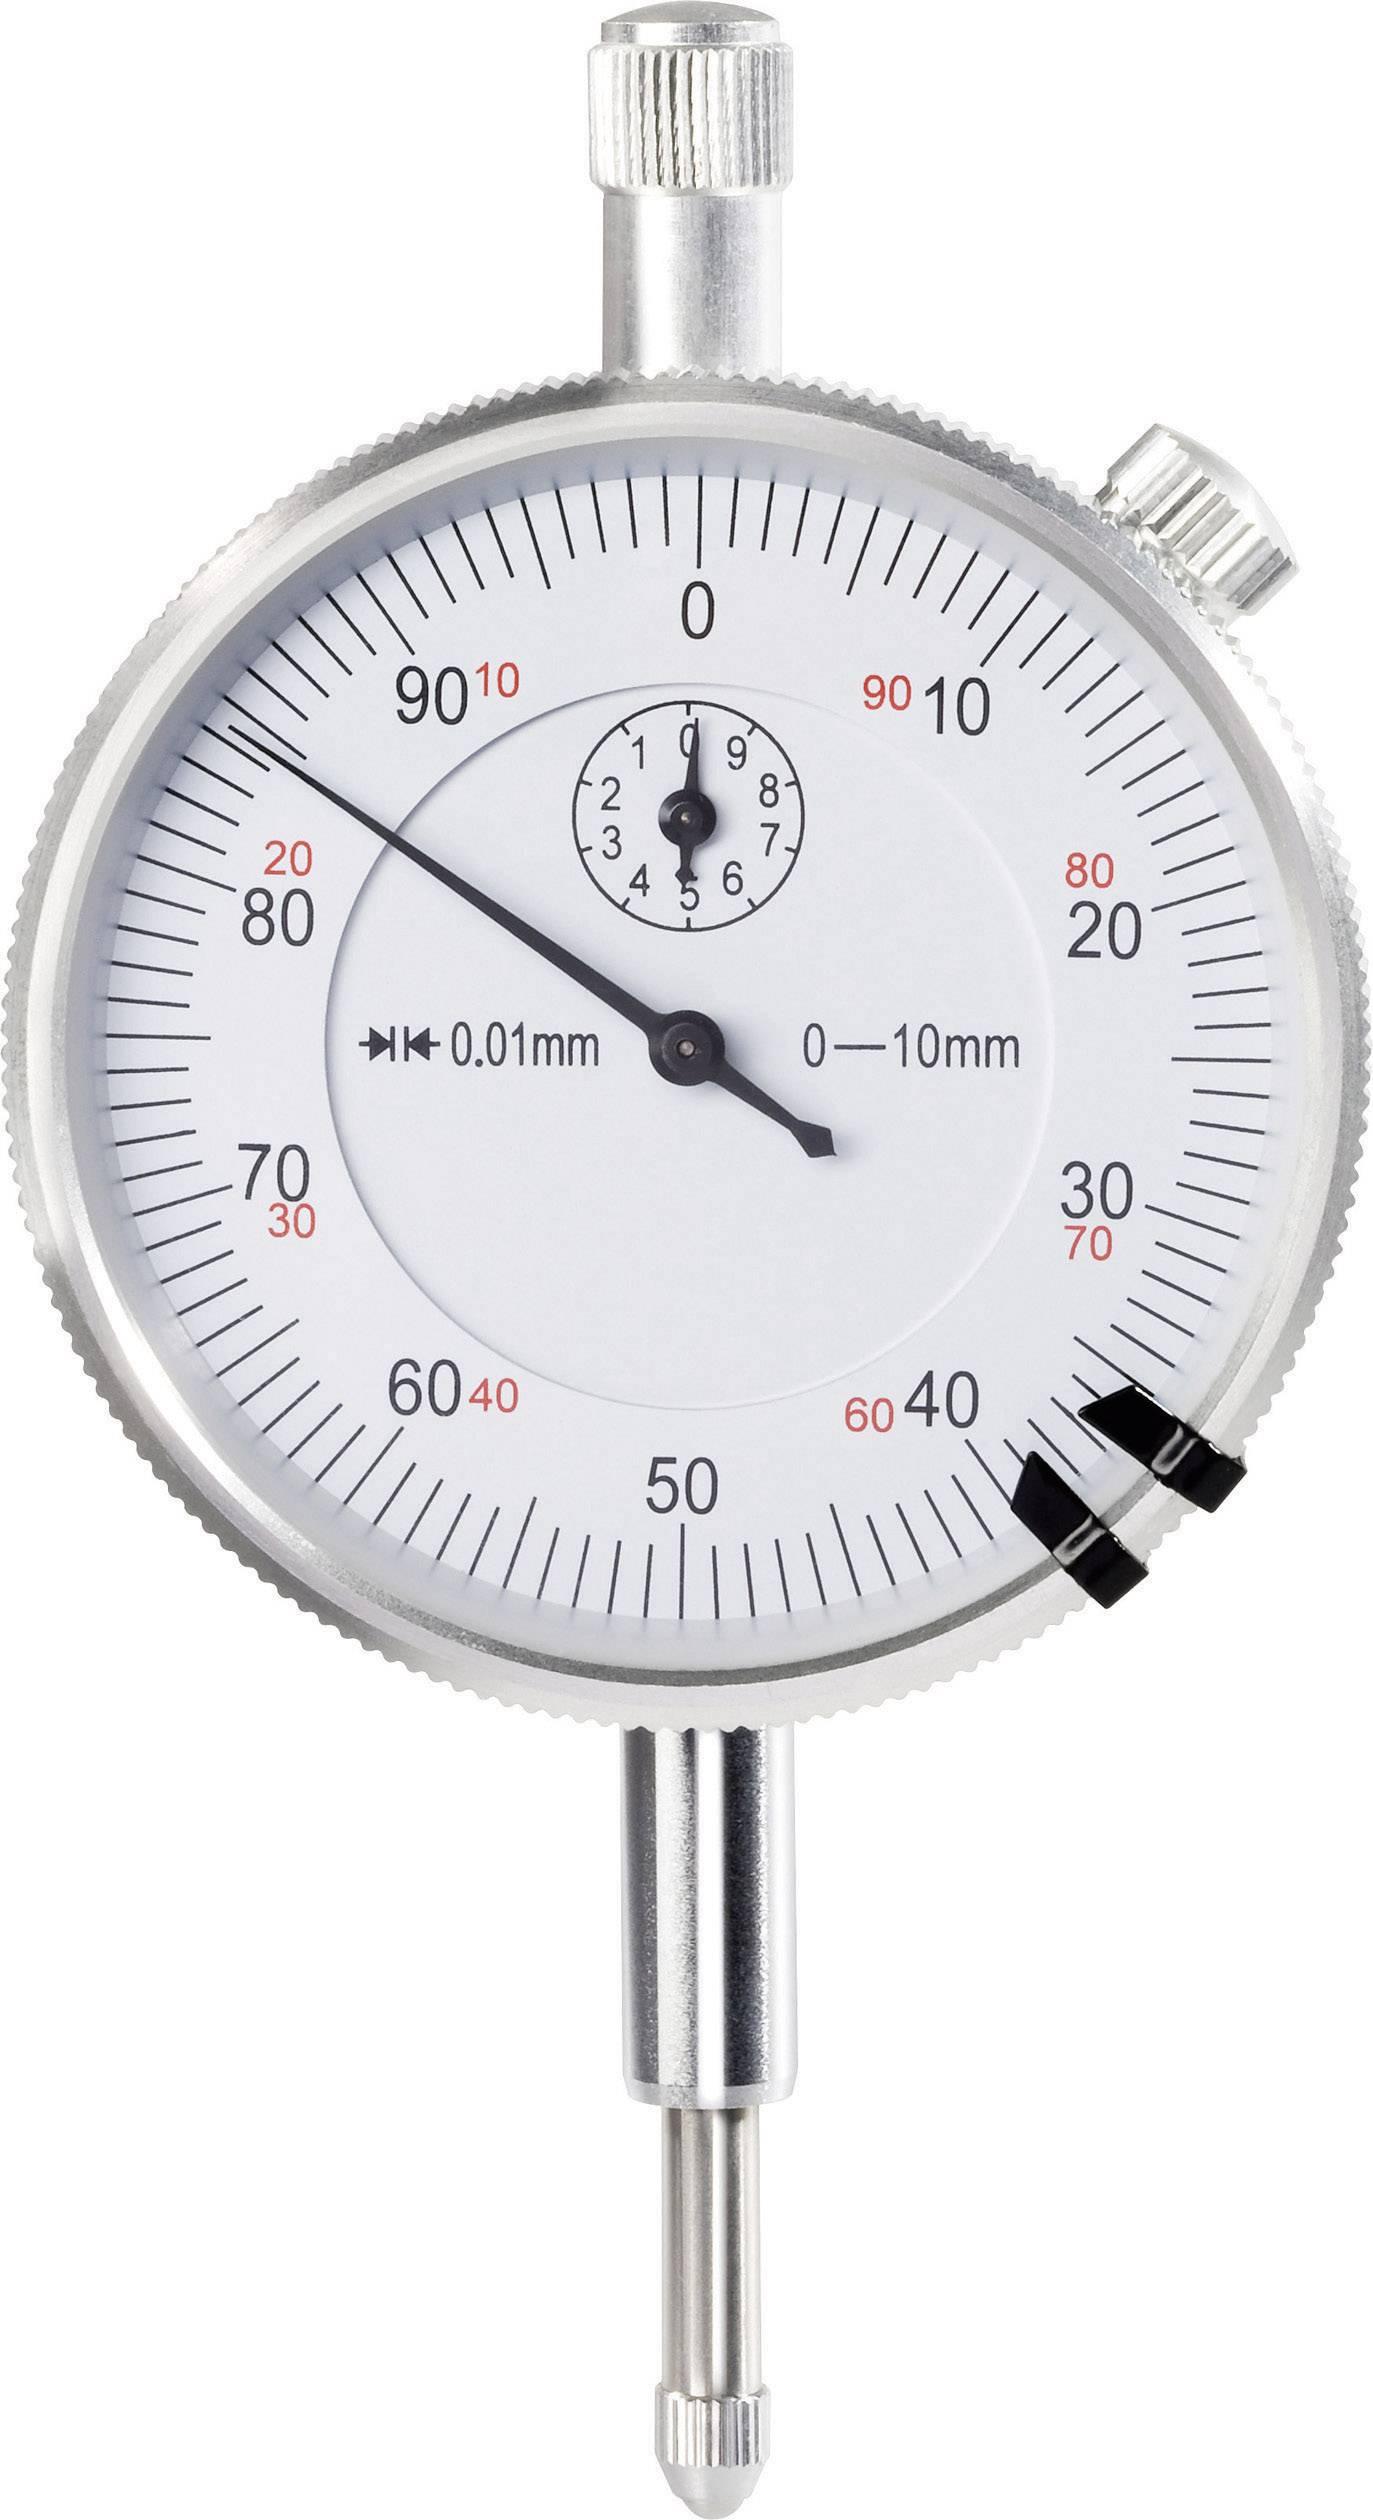 Úchylkomer Toolcraft 821008, 0.01 mm